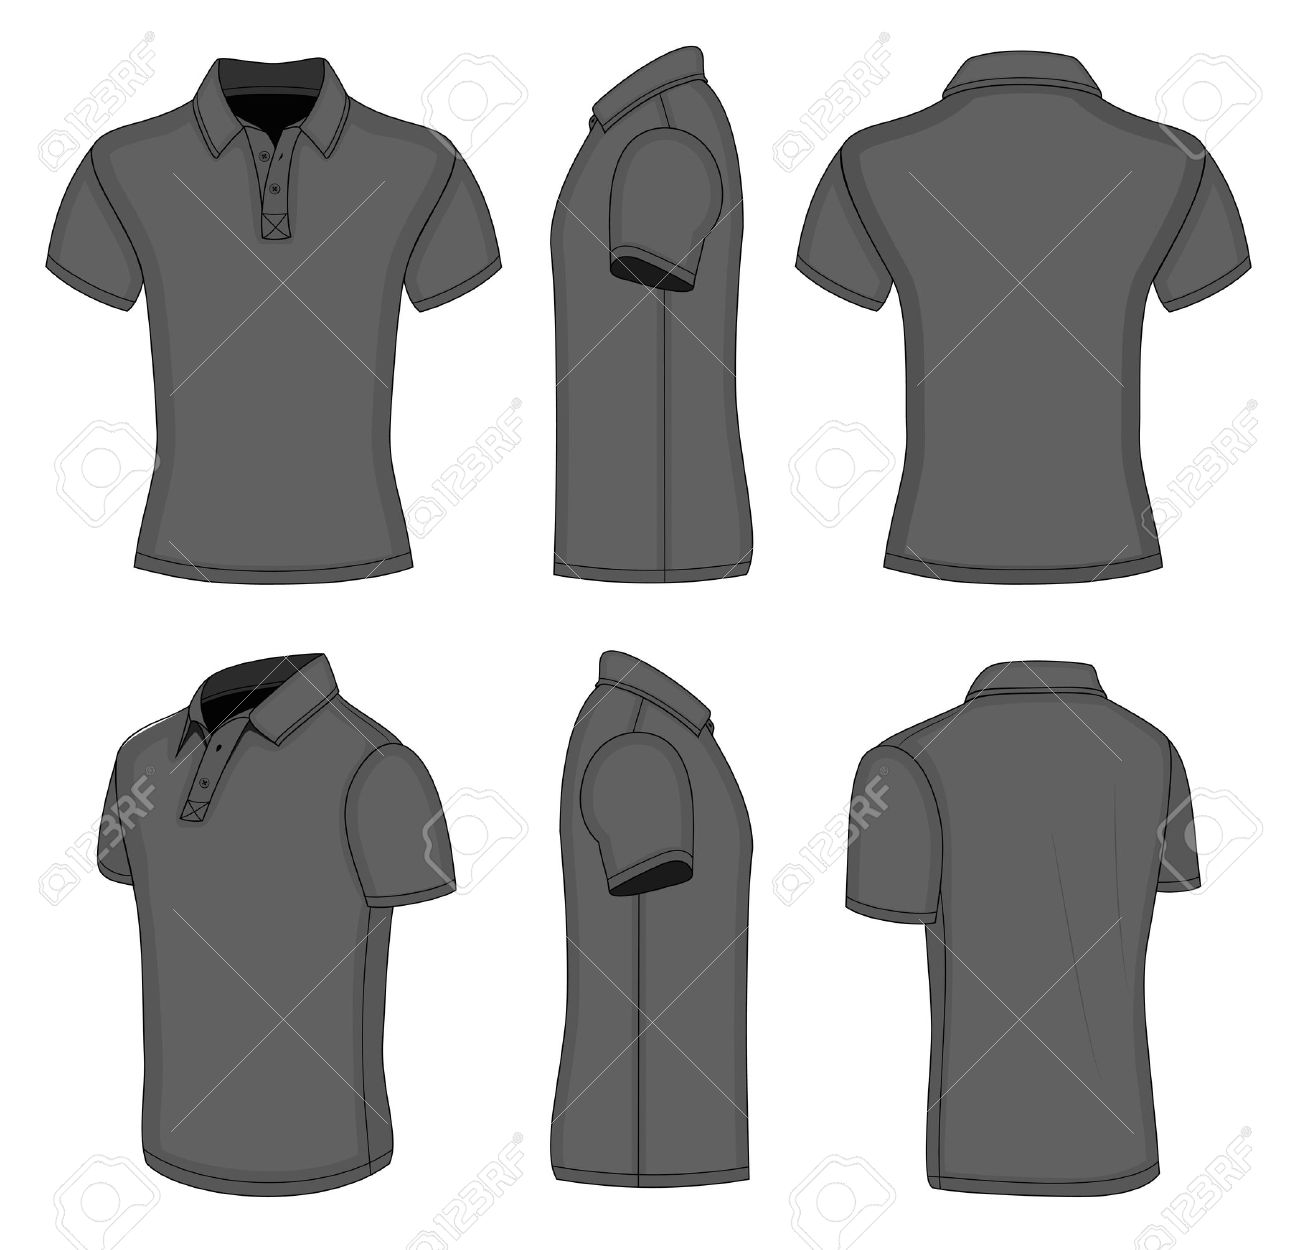 Shirt design black - Mens Shirt Mens Black Short Sleeve Polo Shirt Design Templates